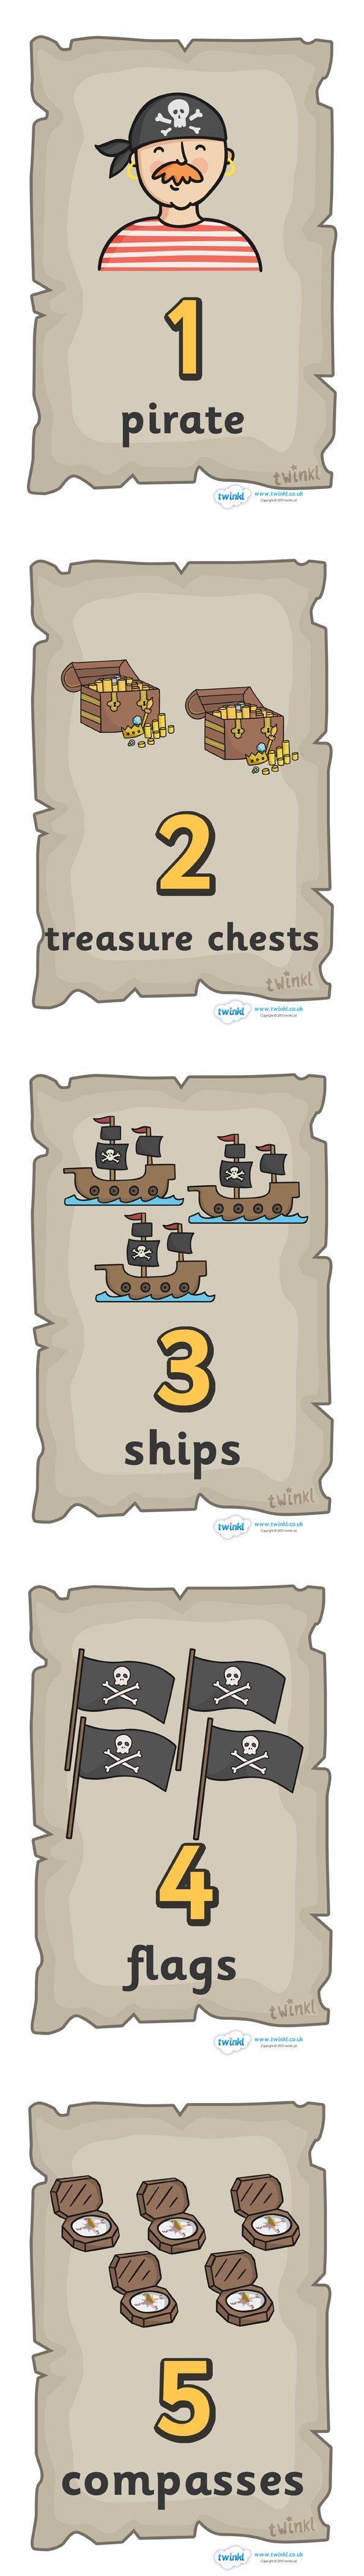 thema piraten                                                                                                                                                     Más